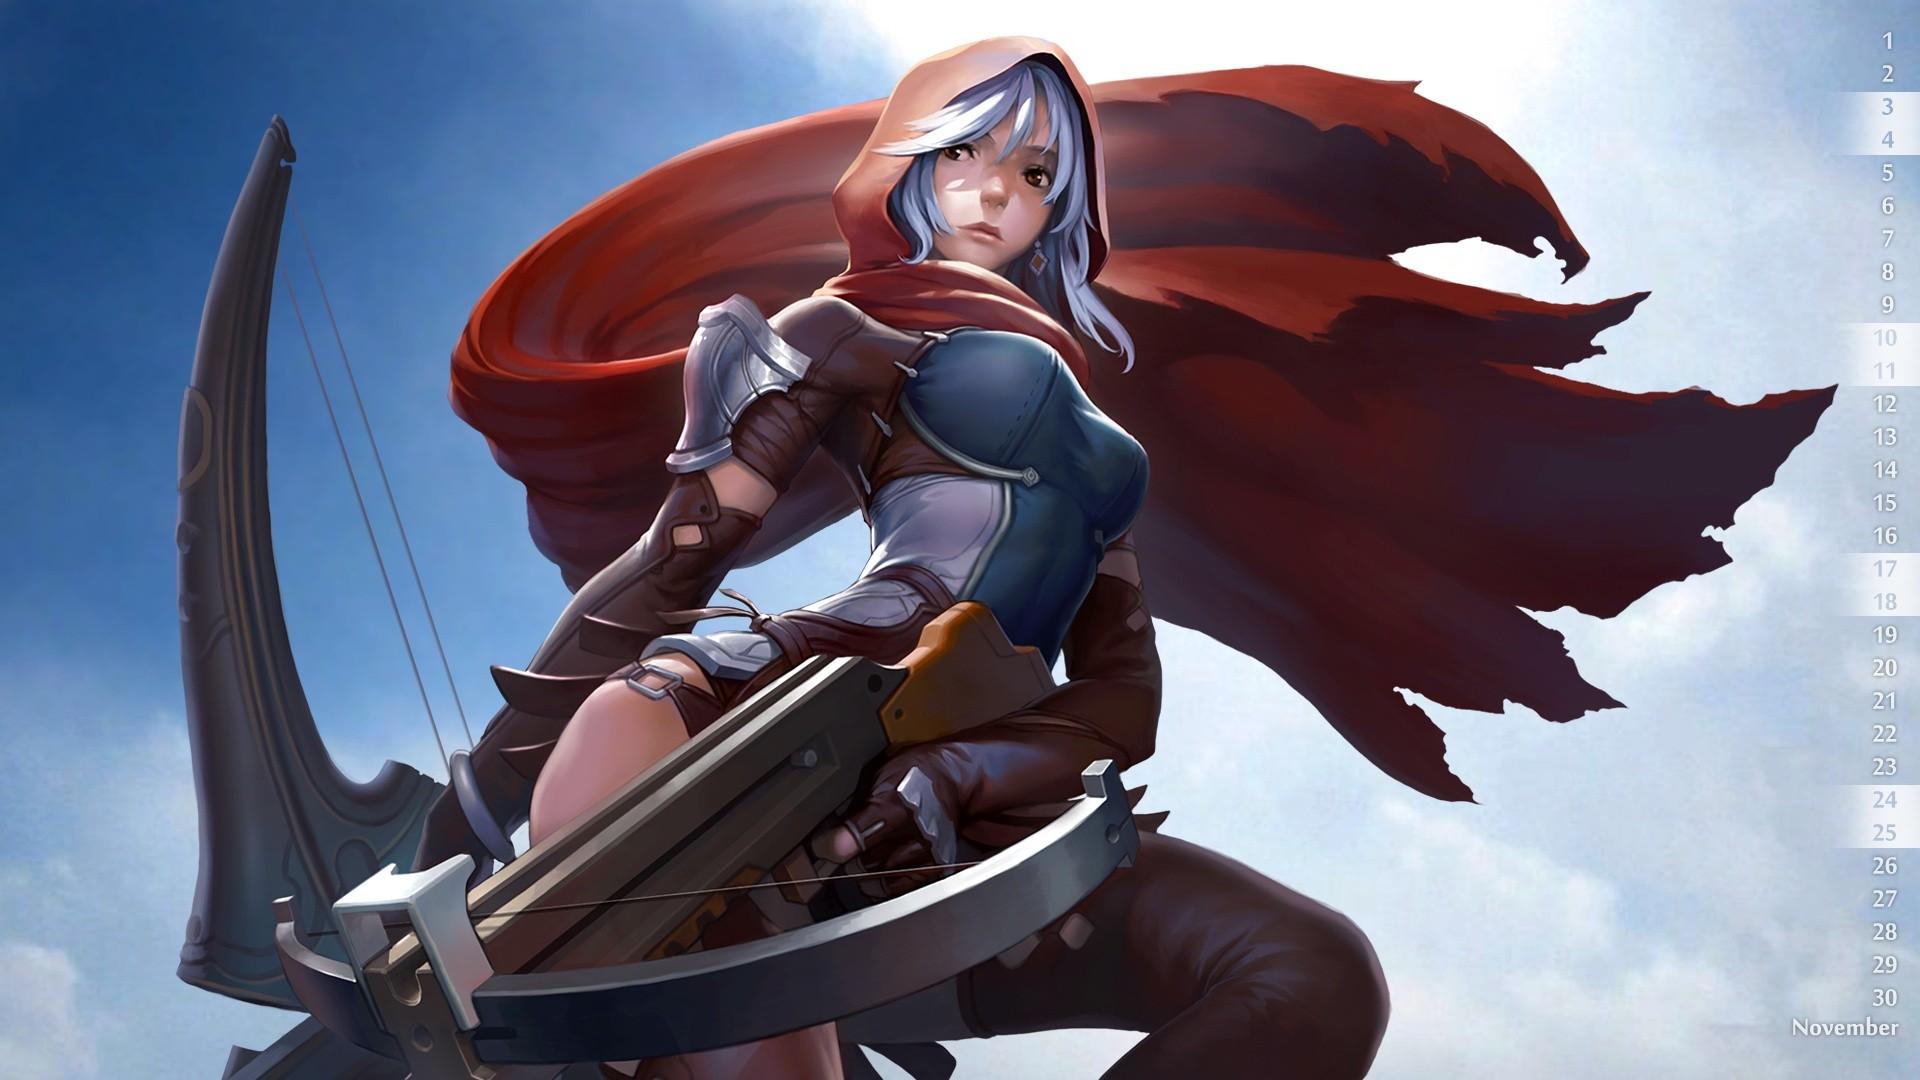 Women Warrior Hd Wallpaper Background Image 1920x1080